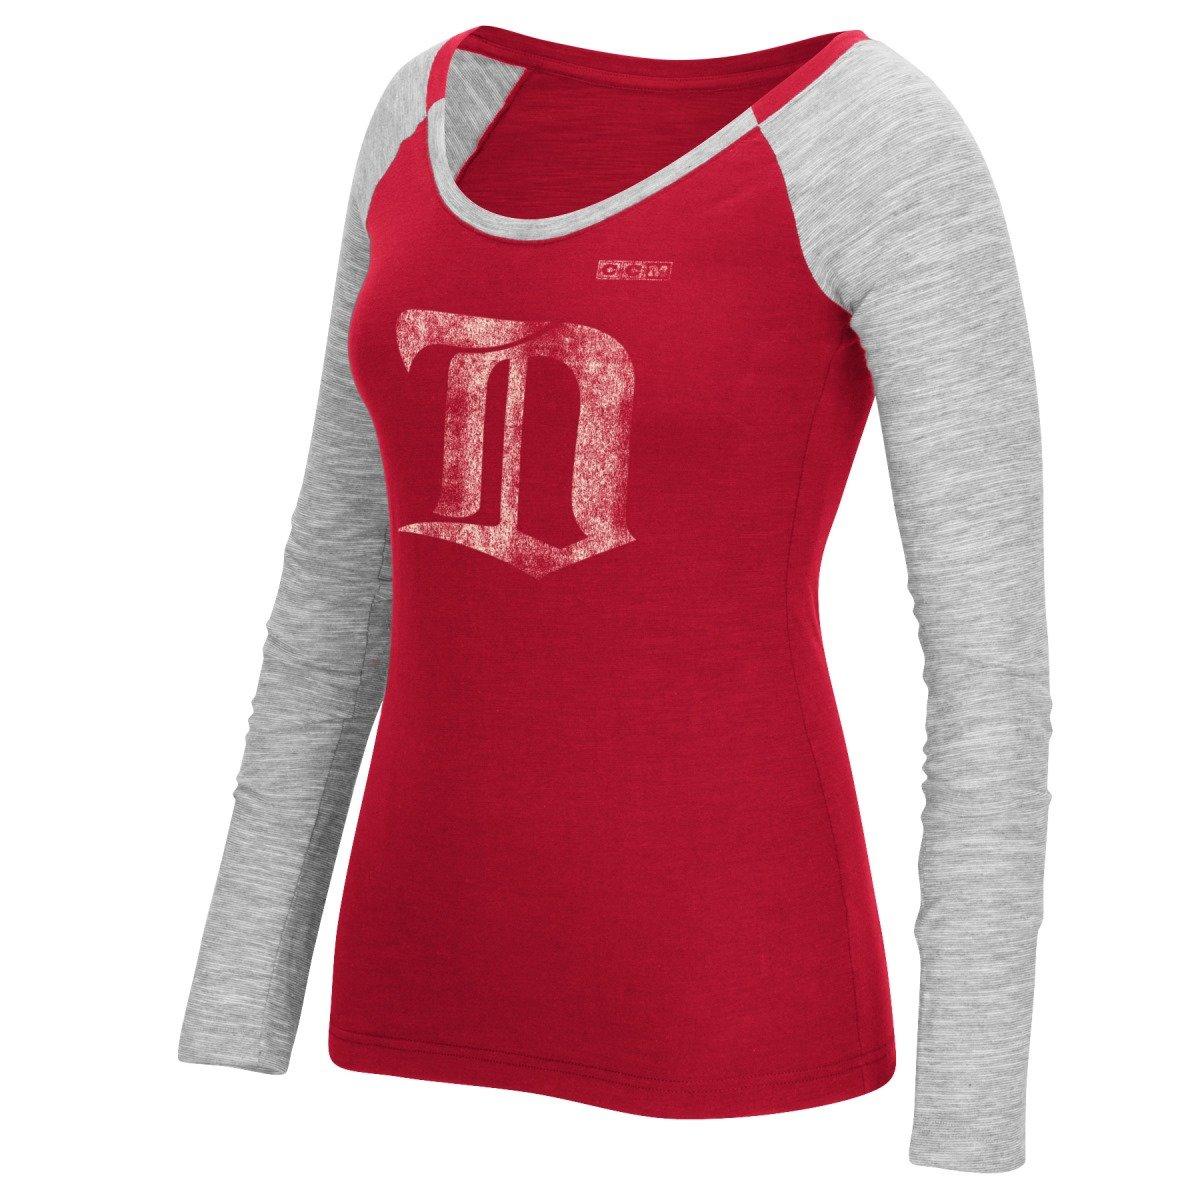 new styles c97d3 9c858 Amazon.com : Reebok Detroit Red Wings Women's NHL CCM Her ...